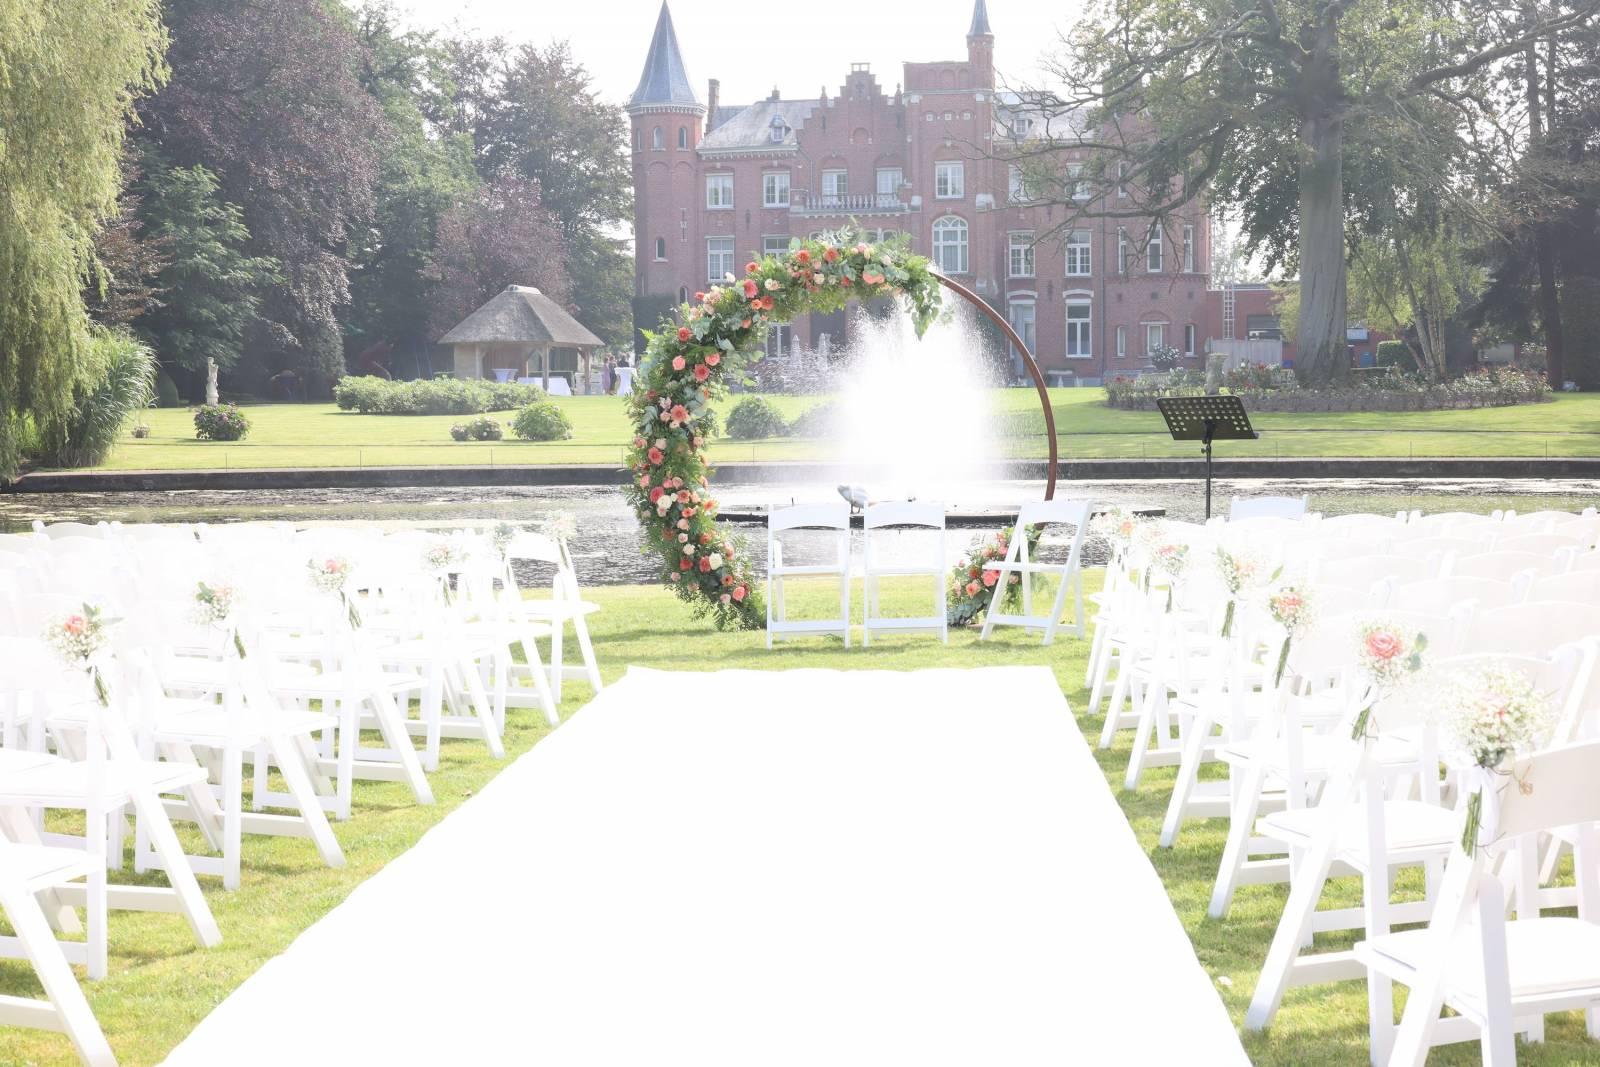 Maison Fleurie - Fotograaf zelfgetrokken - House of Weddings - 16